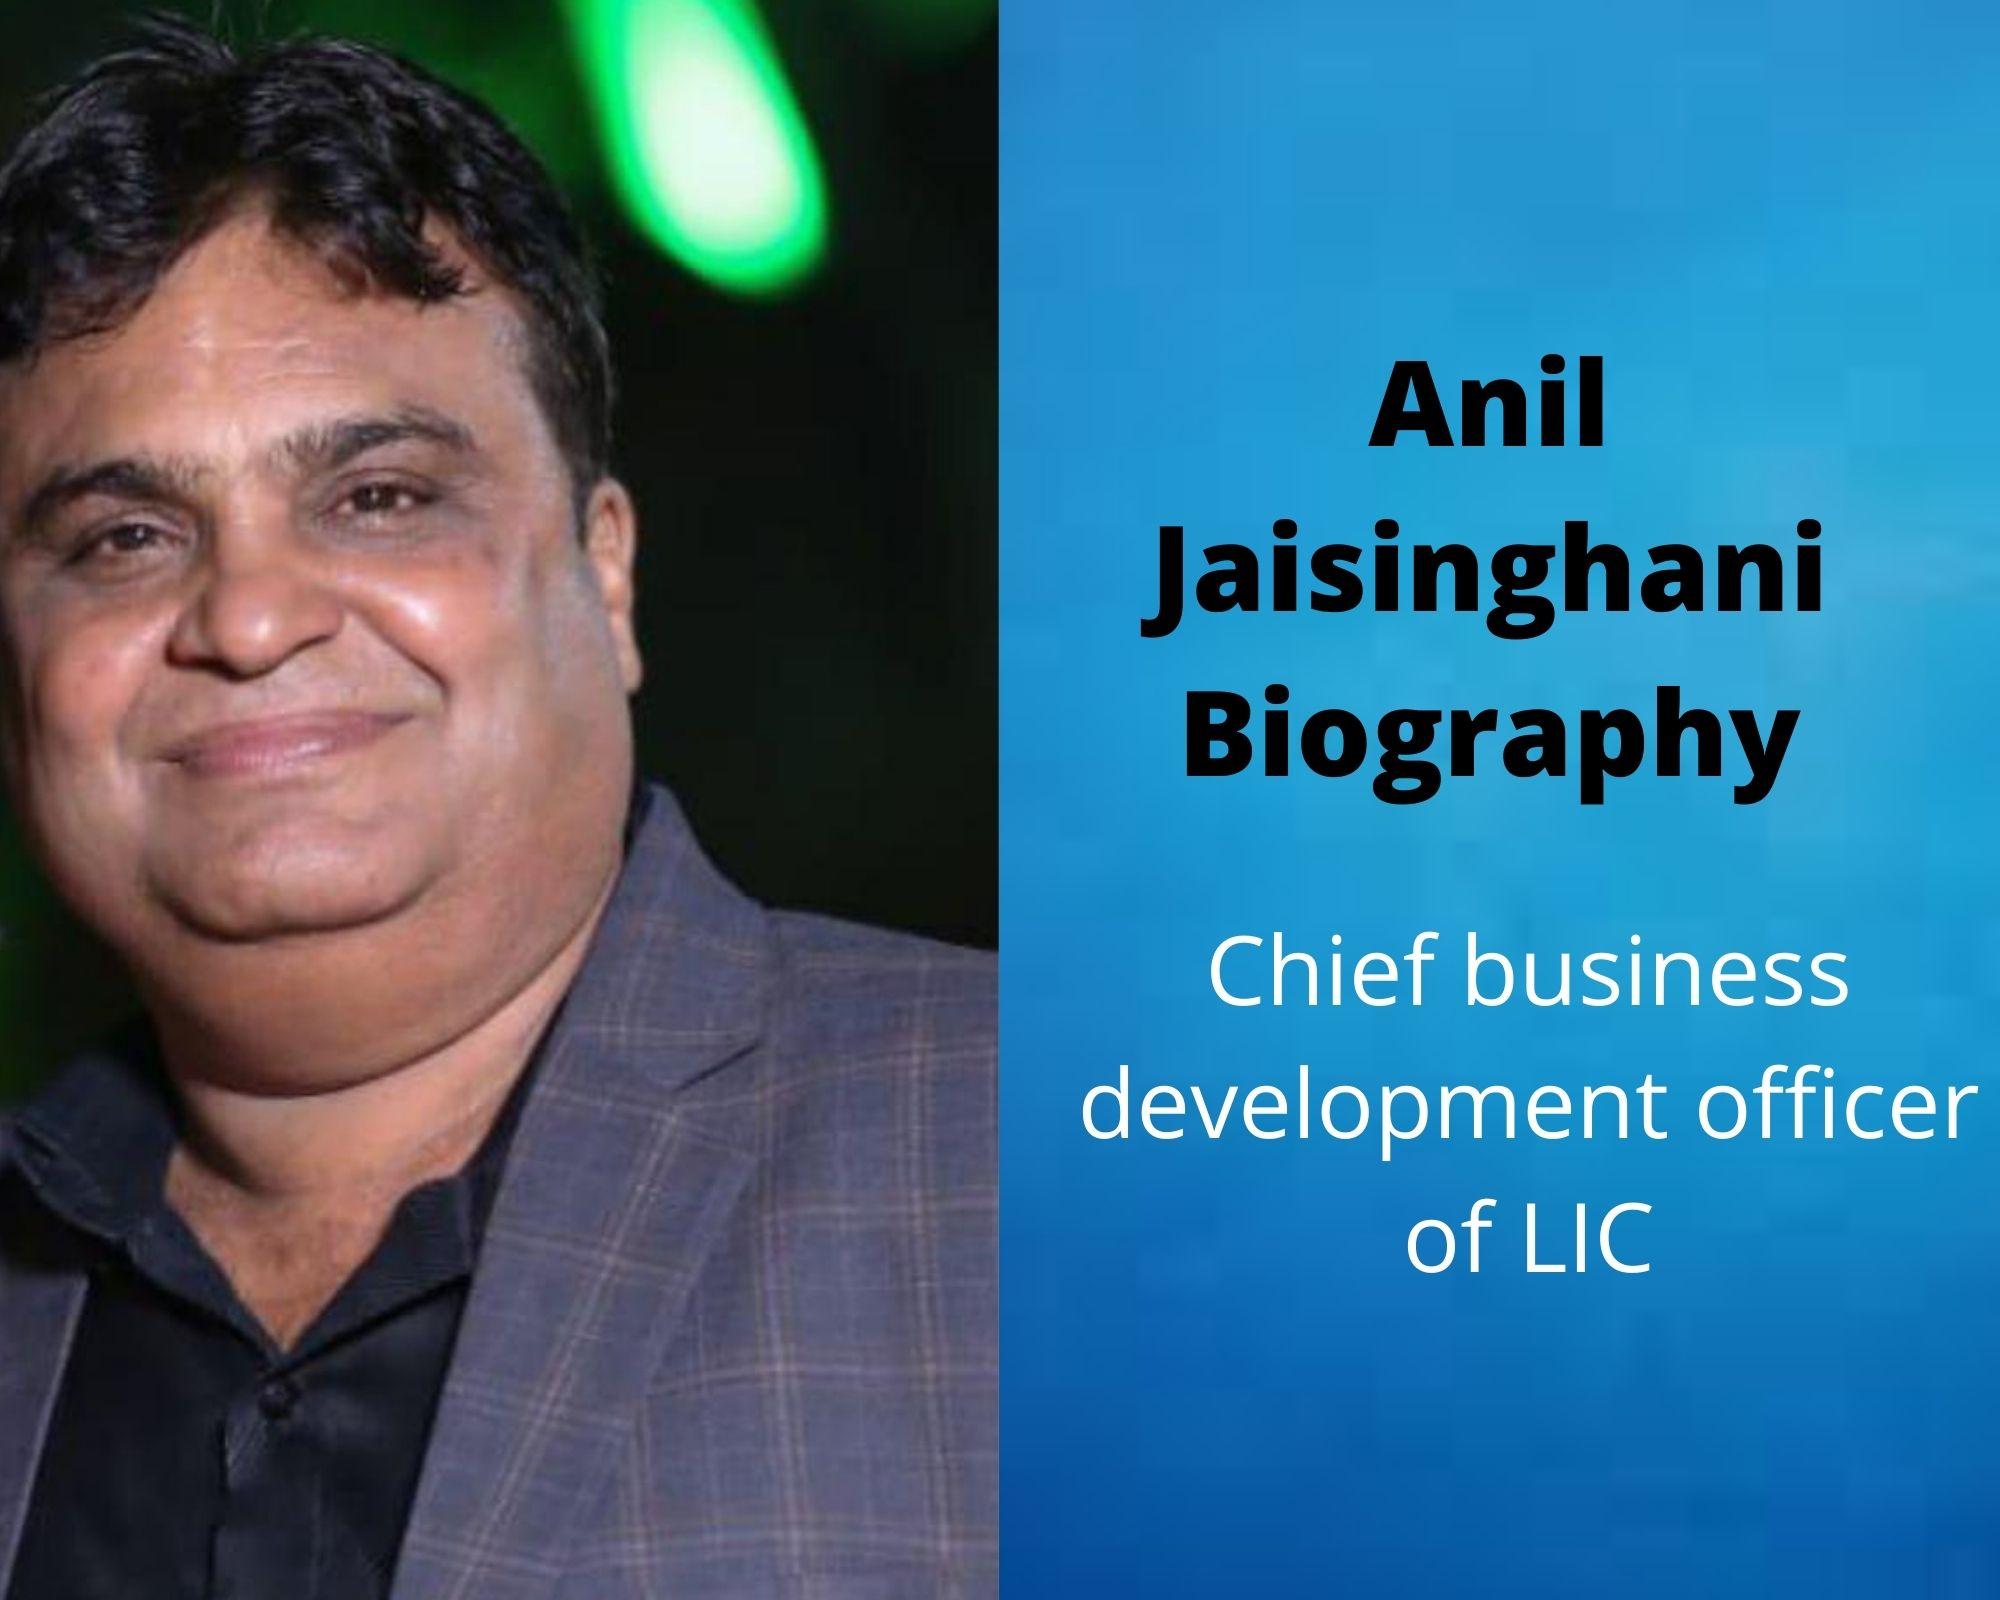 Anil Jaisinghani Biography